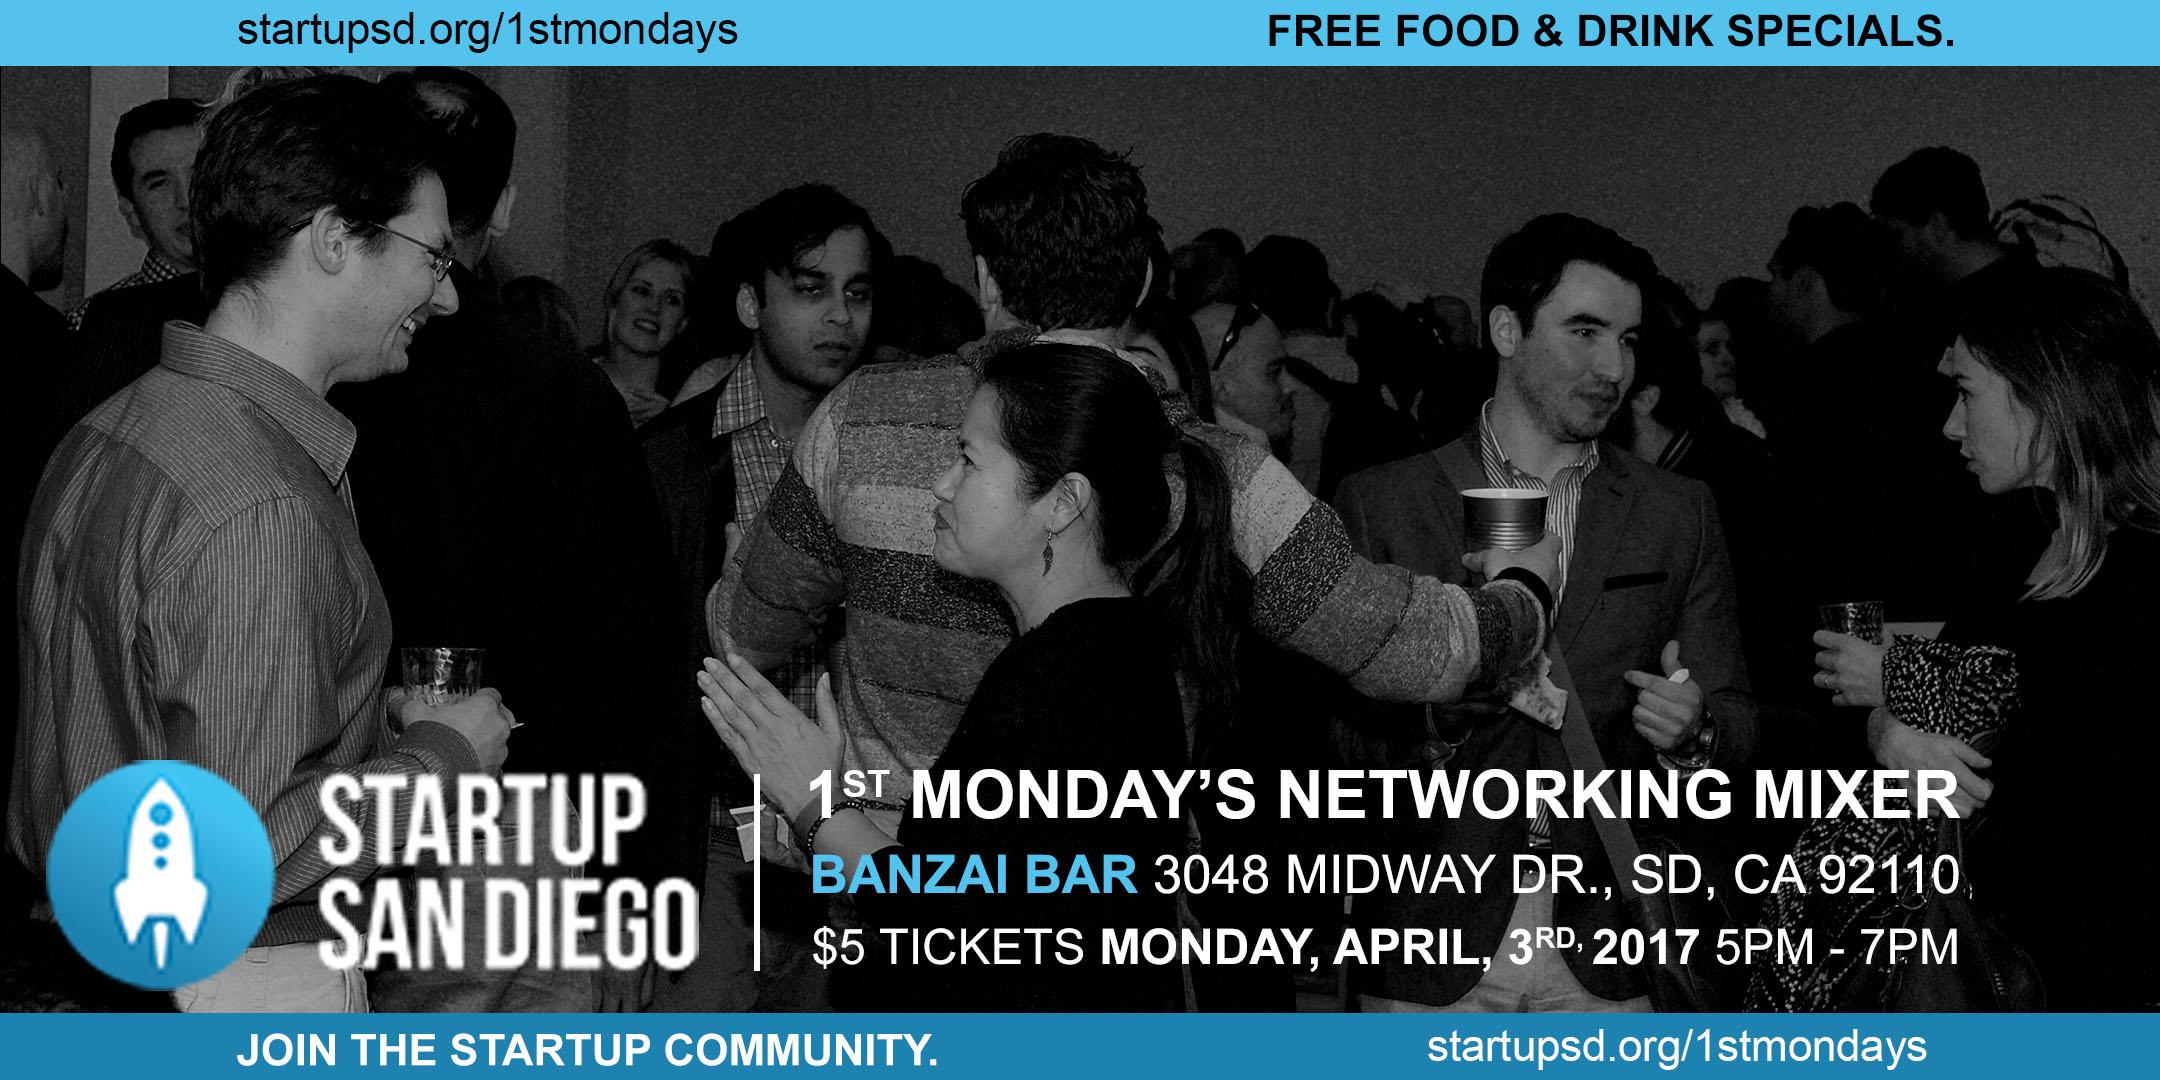 Monthly Networking Mixer @ Banzai Bar